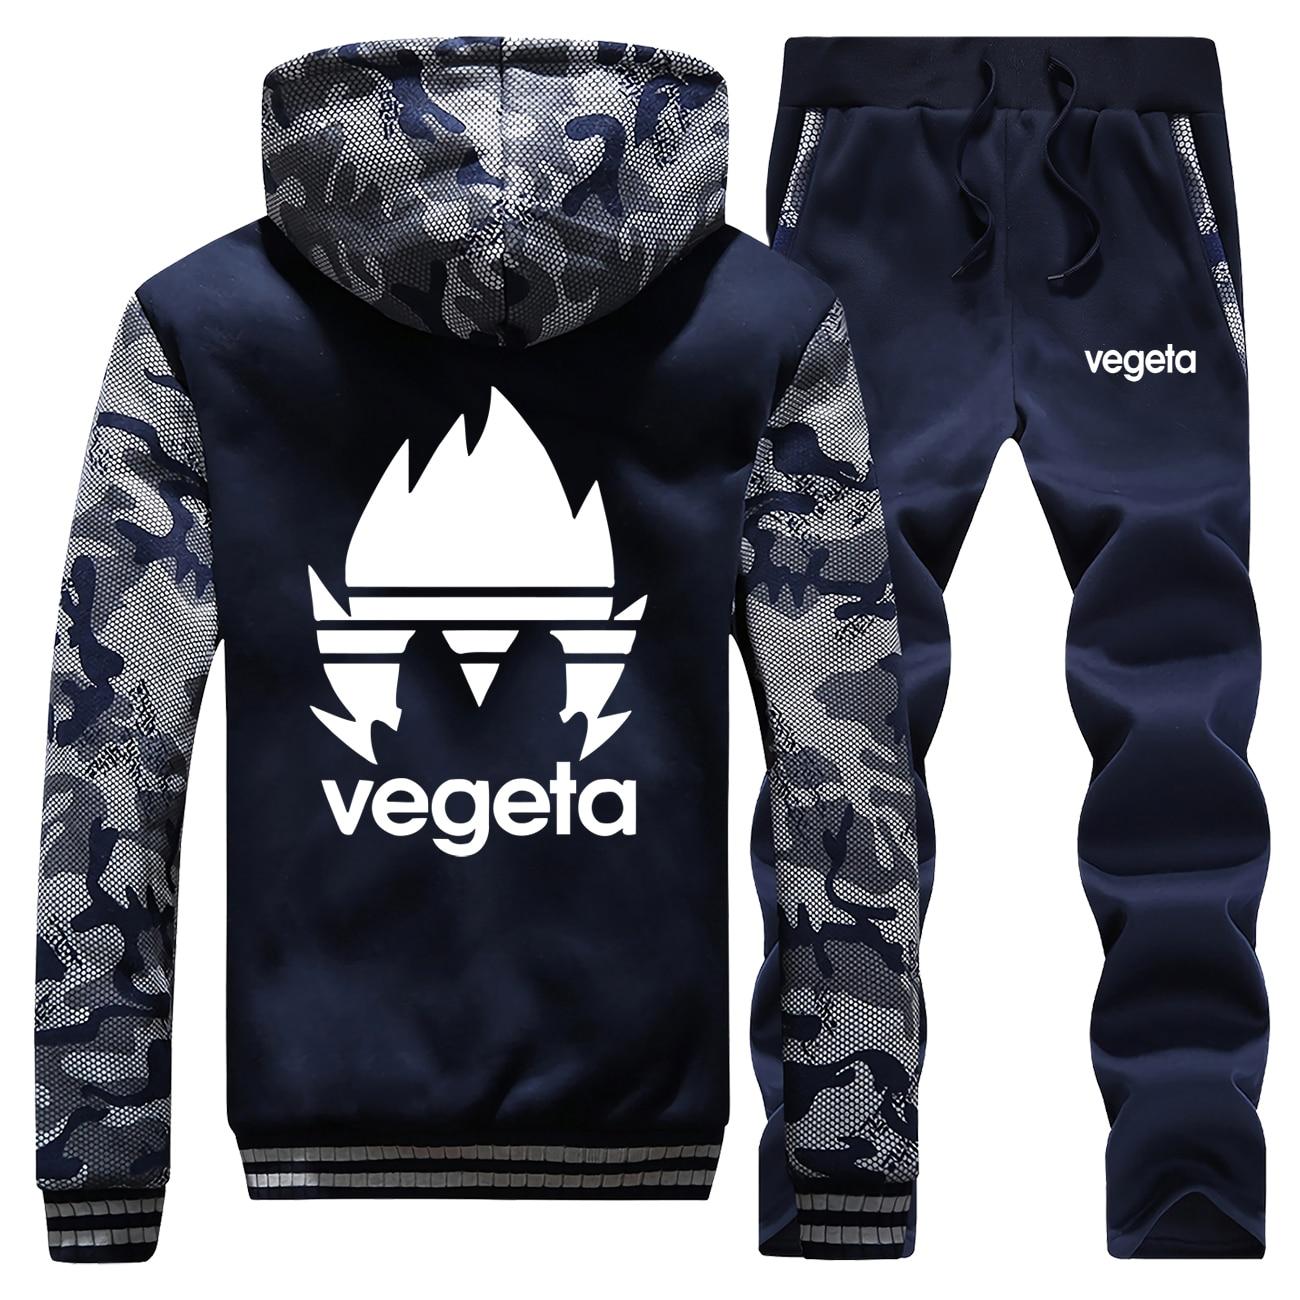 DragonBall Z Vegeta Print Mens Thick Hoodies Camo Sweatshirt+Sweatpants 2 Piece Sets Winter Warm Brand Jacket Dragon Ball Coat